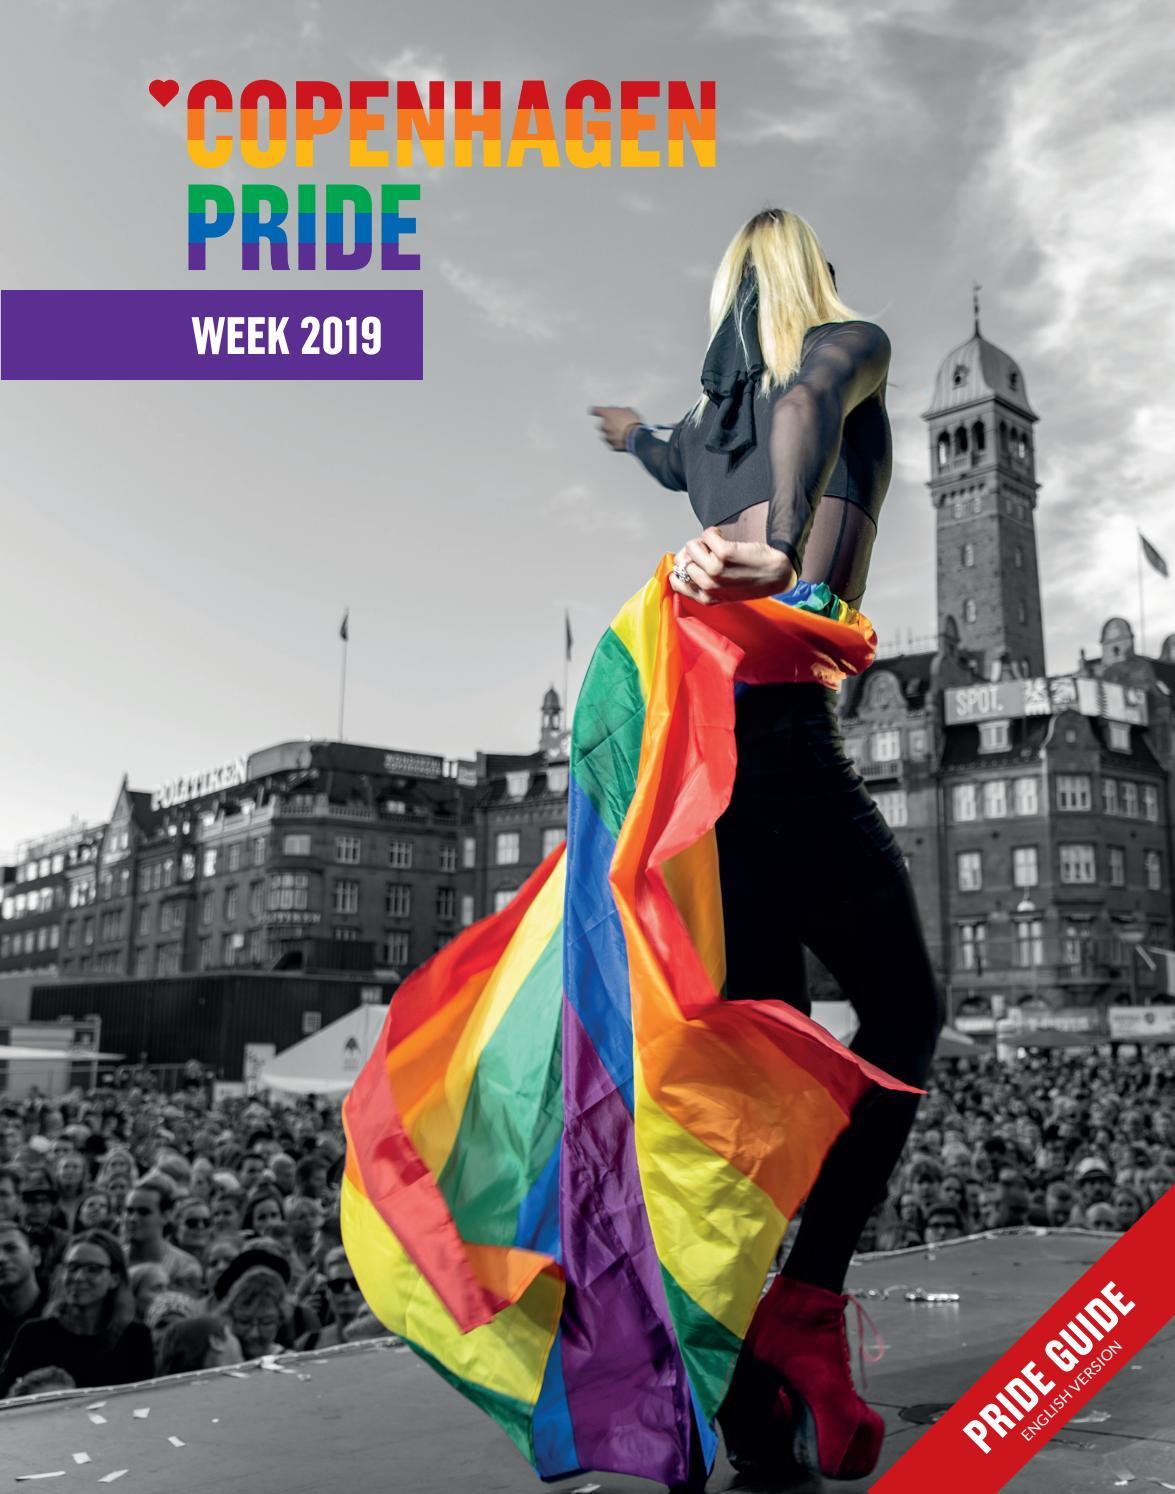 Copenhagen Pride Guide 2019 / English by Copenhagen Pride - issuu